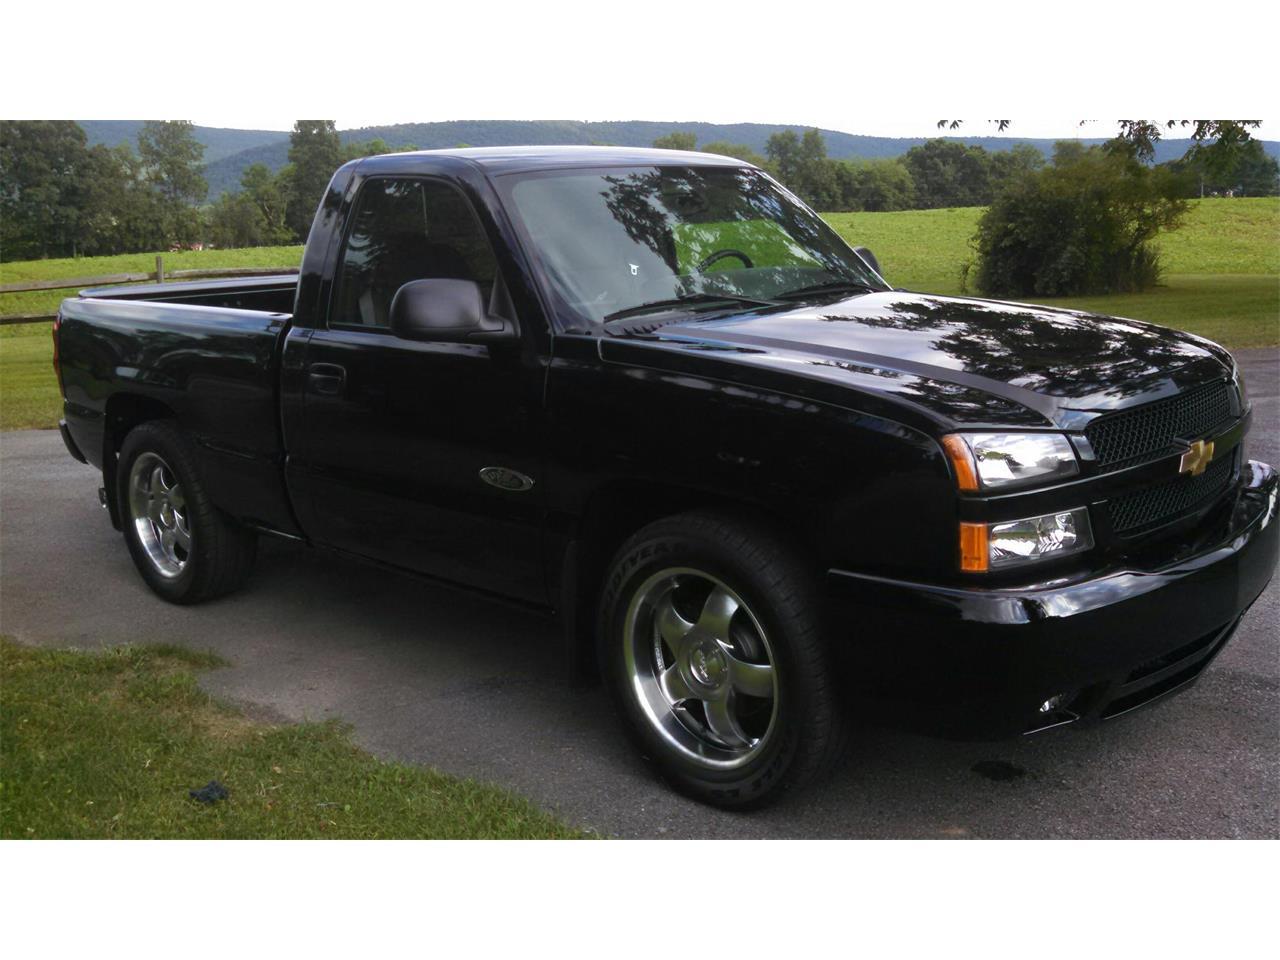 2005 Silverado For Sale >> 2005 Chevrolet Silverado Joe Gibbs Edition For Sale